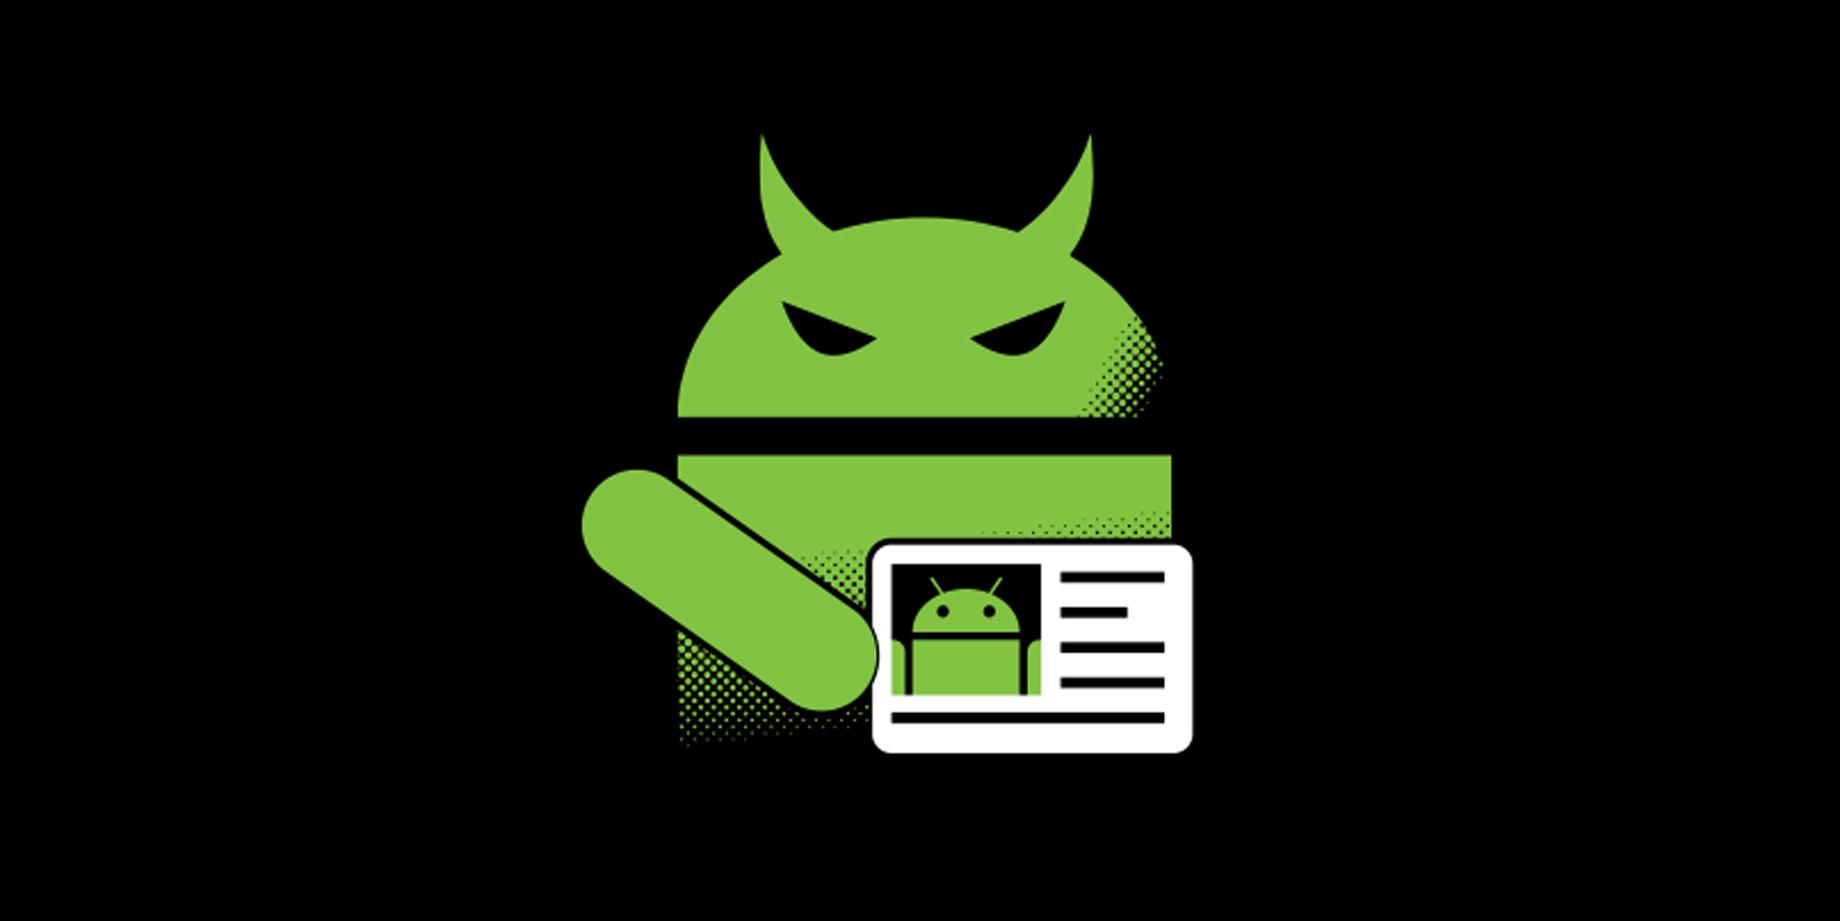 1487658364_android-virus.jpg